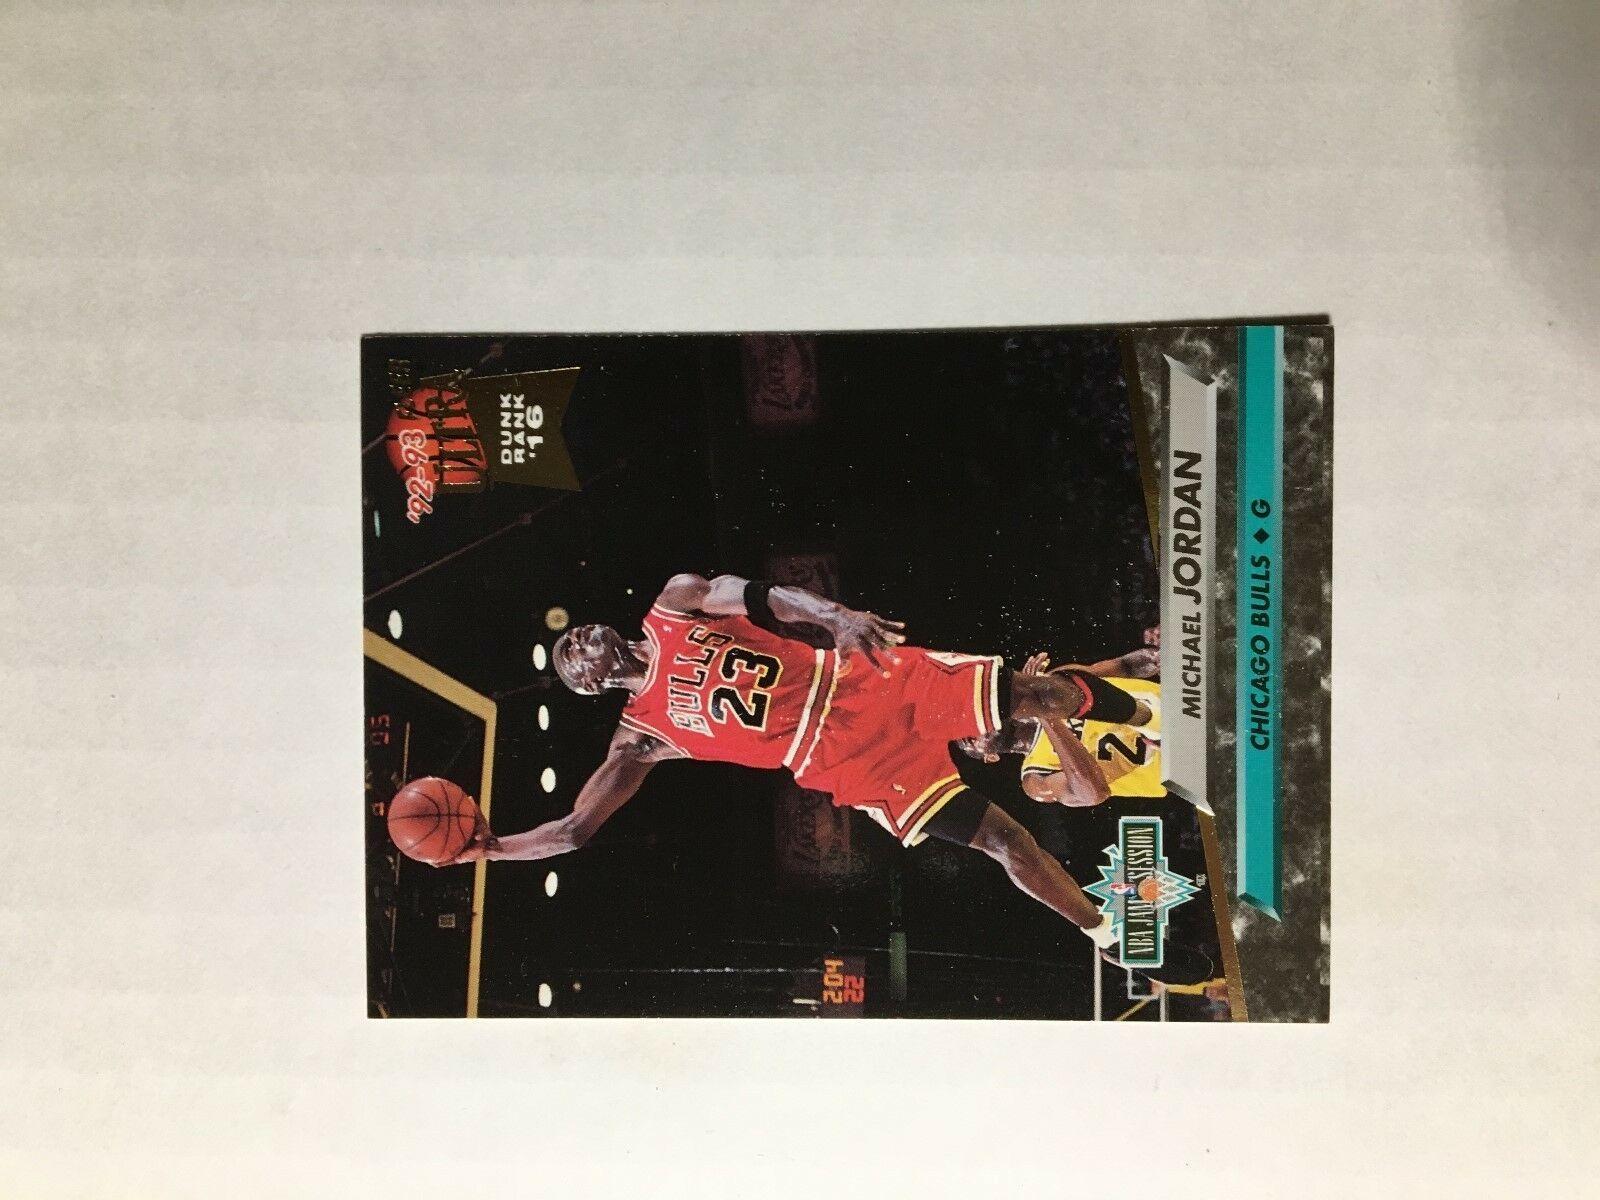 1992-93 Fleer Ultra Basketball Series 2 Set #201-375 - Shaq Rookie